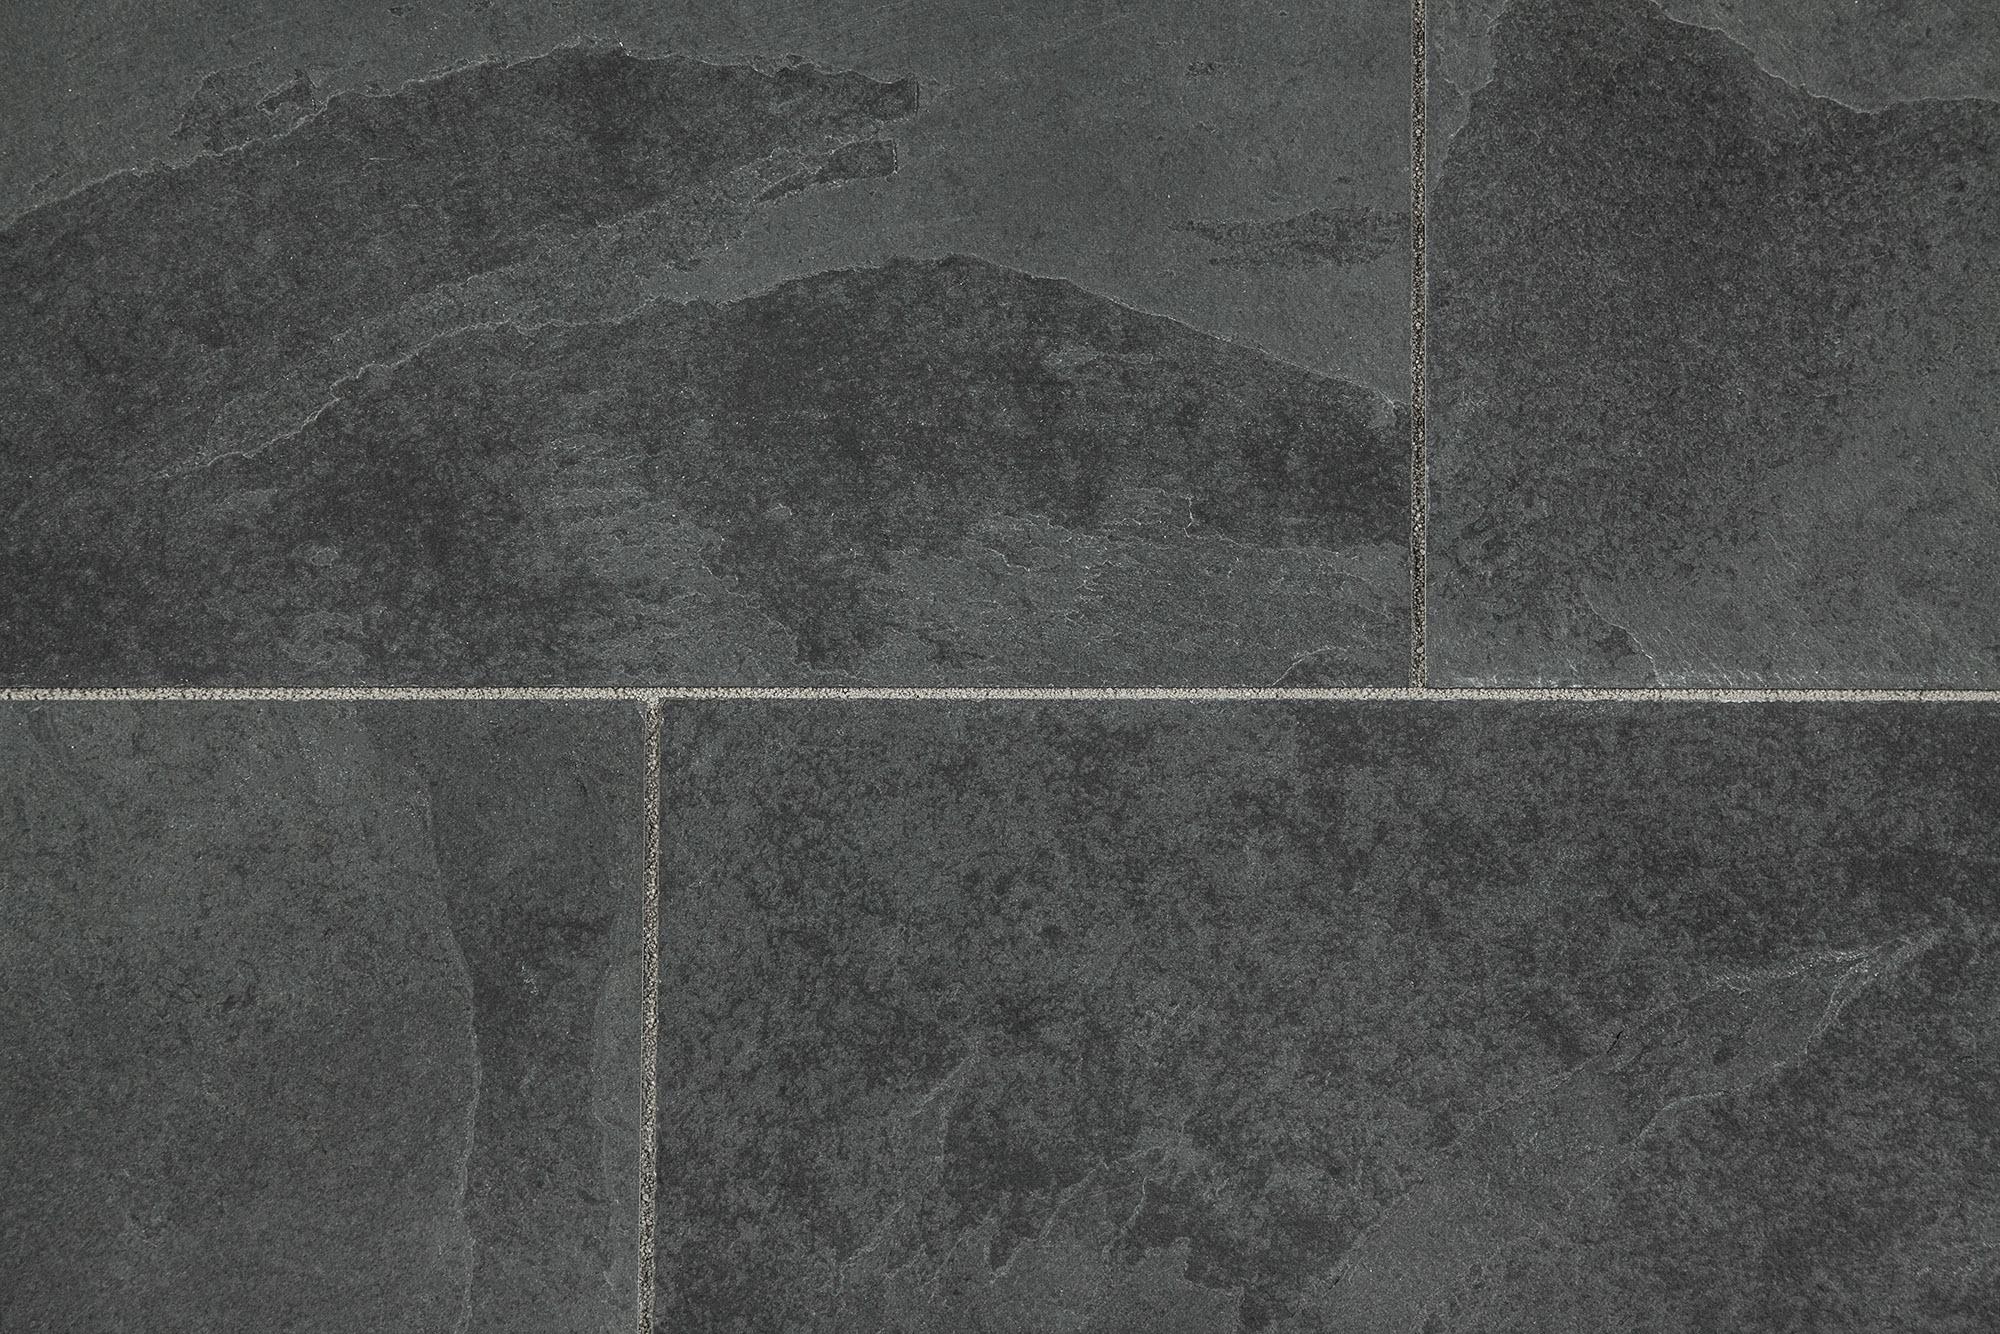 Free samples janeiro slate tile montauk black 16x16 natural dailygadgetfo Gallery